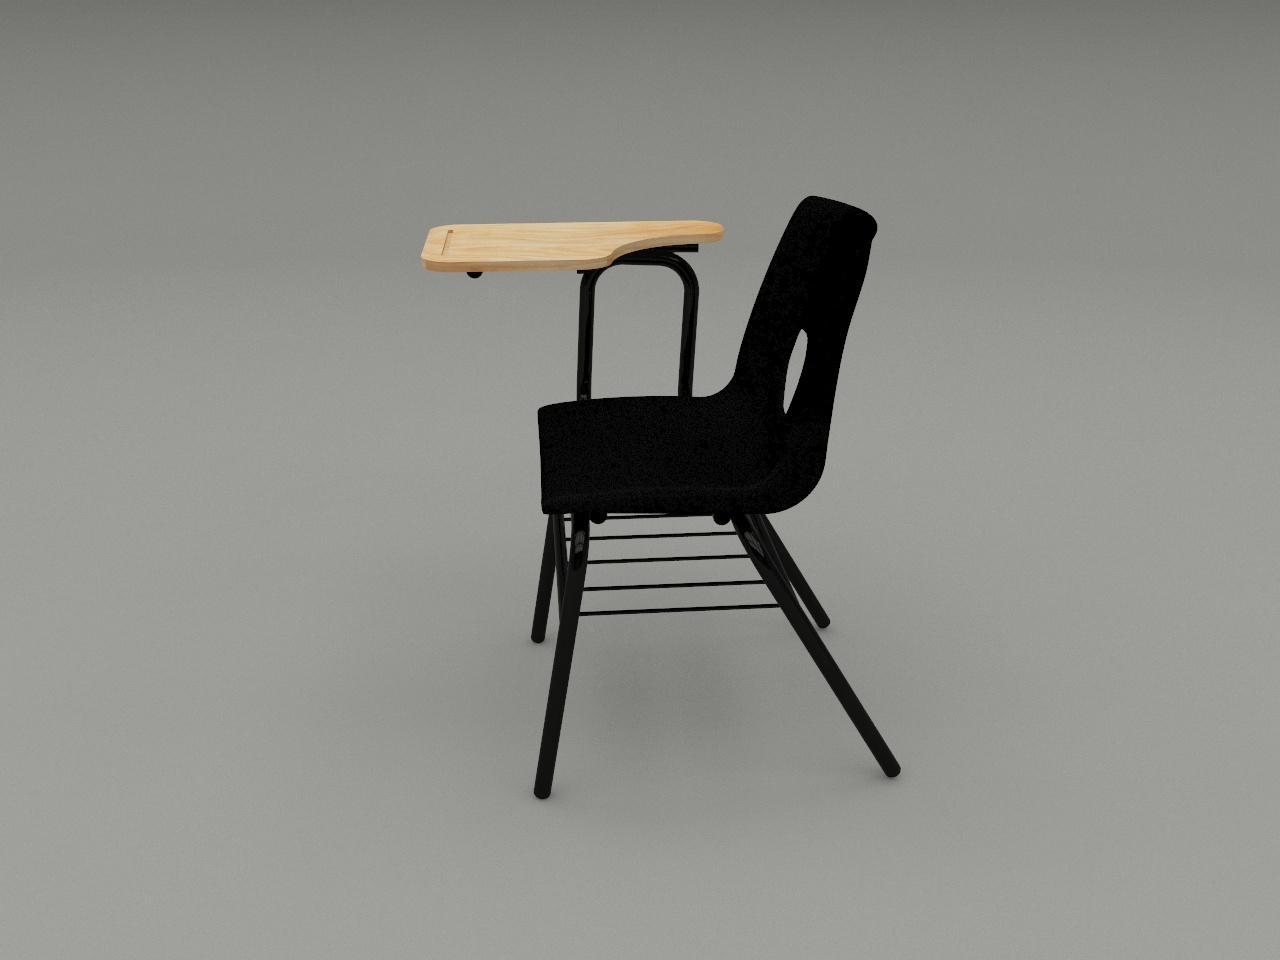 silla de paleta concha plastica color negro paleta de triplay